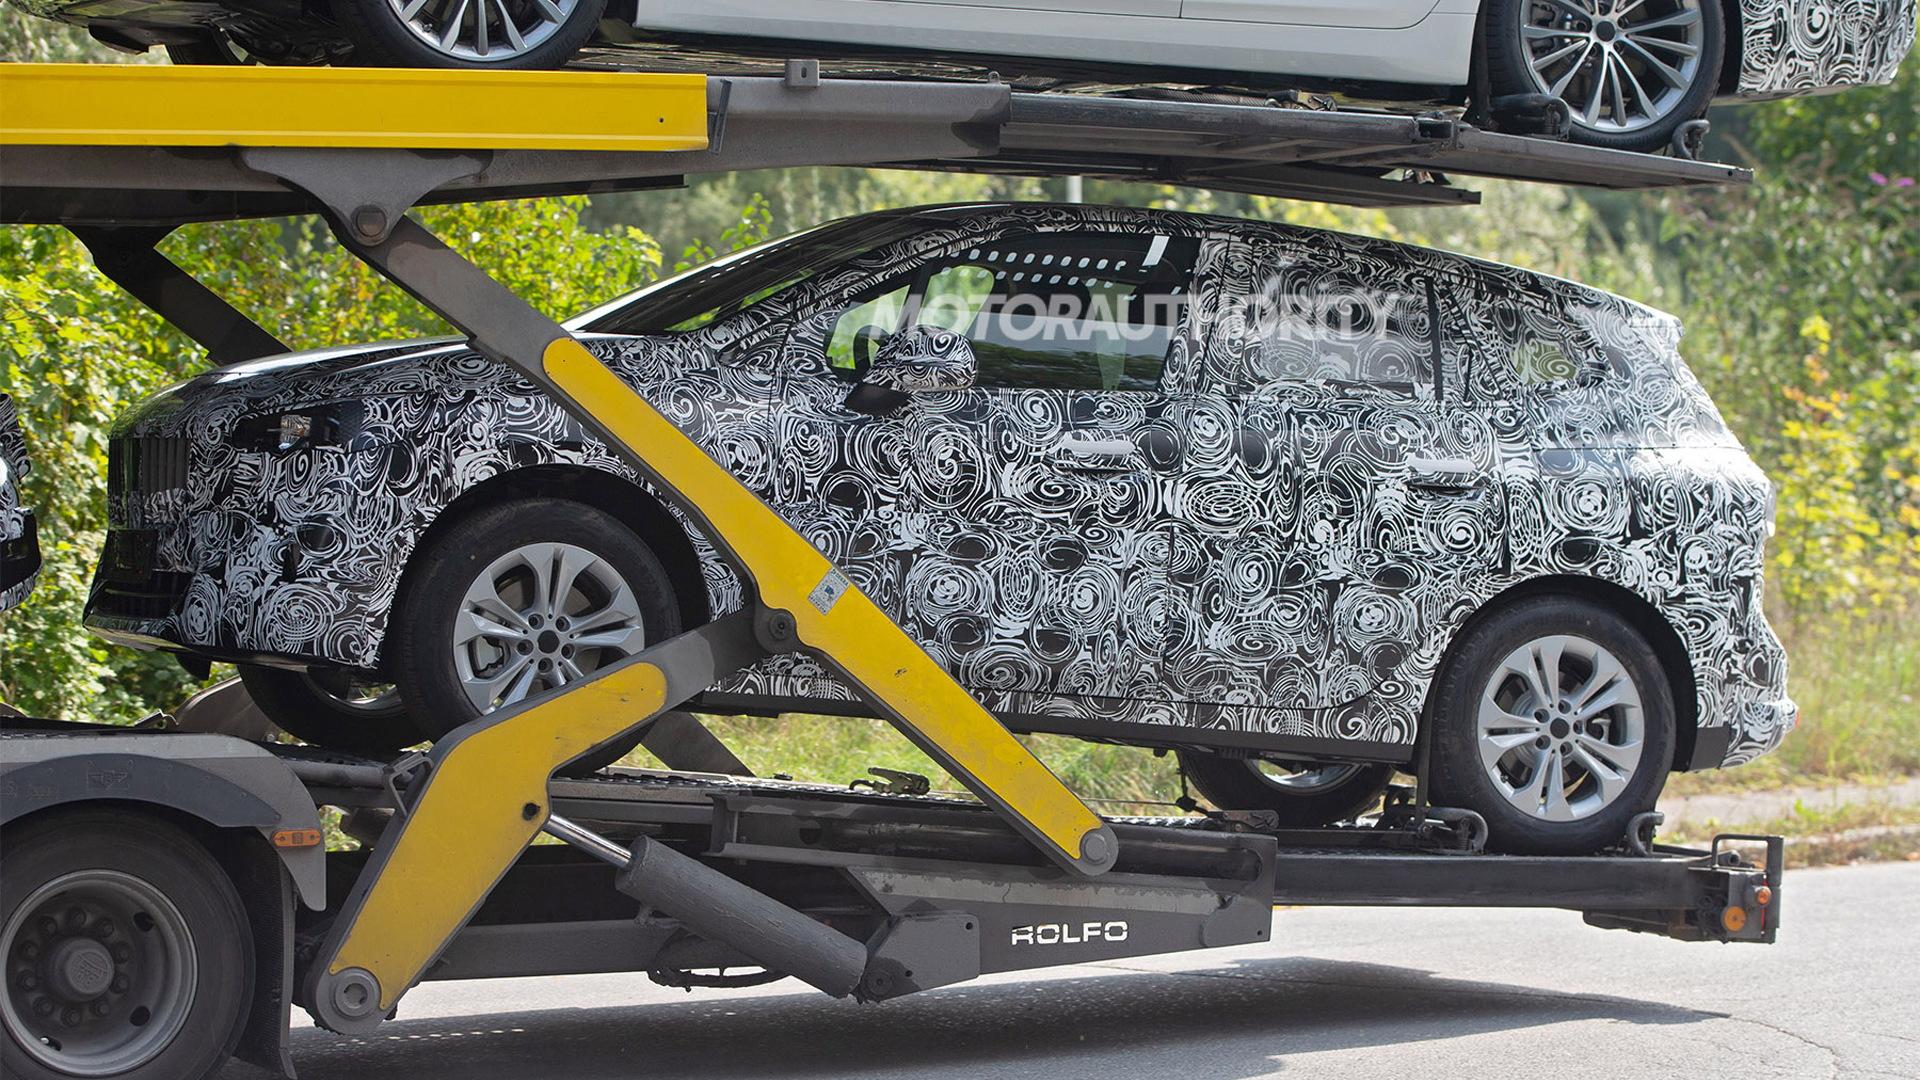 2021 BMW 2-Series Active Tourer spy shots - Photo credit: S. Baldauf/SB-Medien